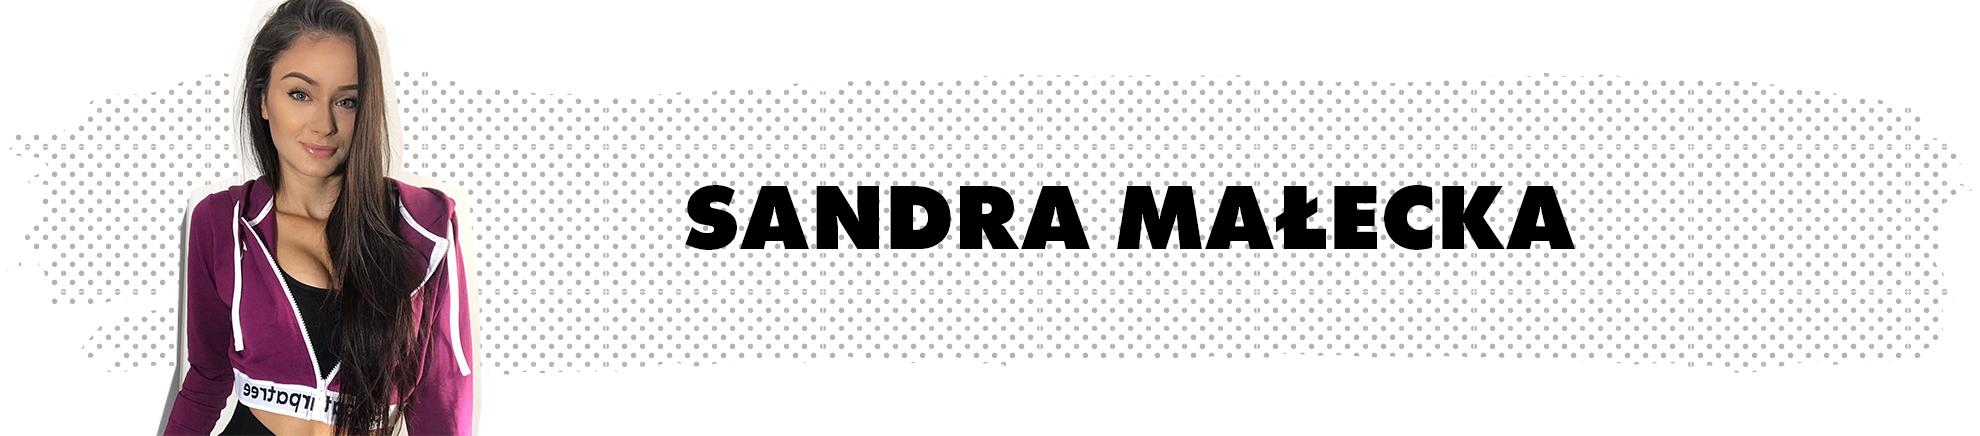 Sandra Małecka Ostentacyjna - ambasadorka marki Carpatree